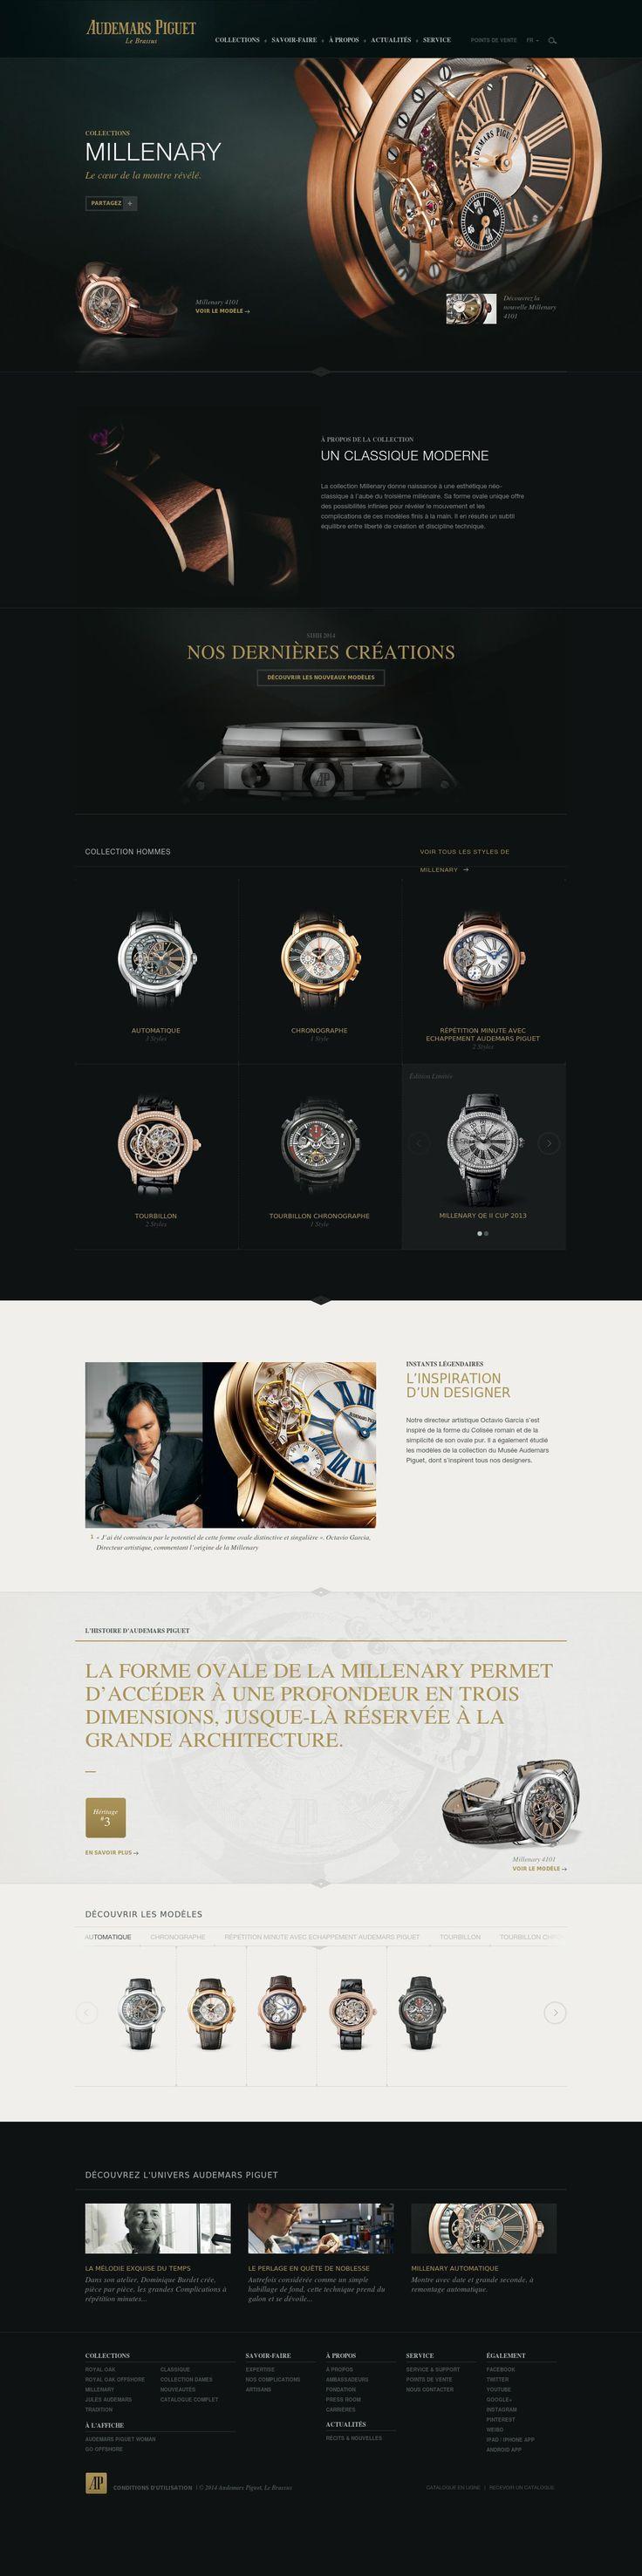 Audemars Piguet website // 상품을 강조한 검은색 배경의 웹디자인. 시계의 금속성 재질과 검은색이 조화로우면서 고급스러운 이미지를 만들어내는 것 같다. 역시 금속엔 검정